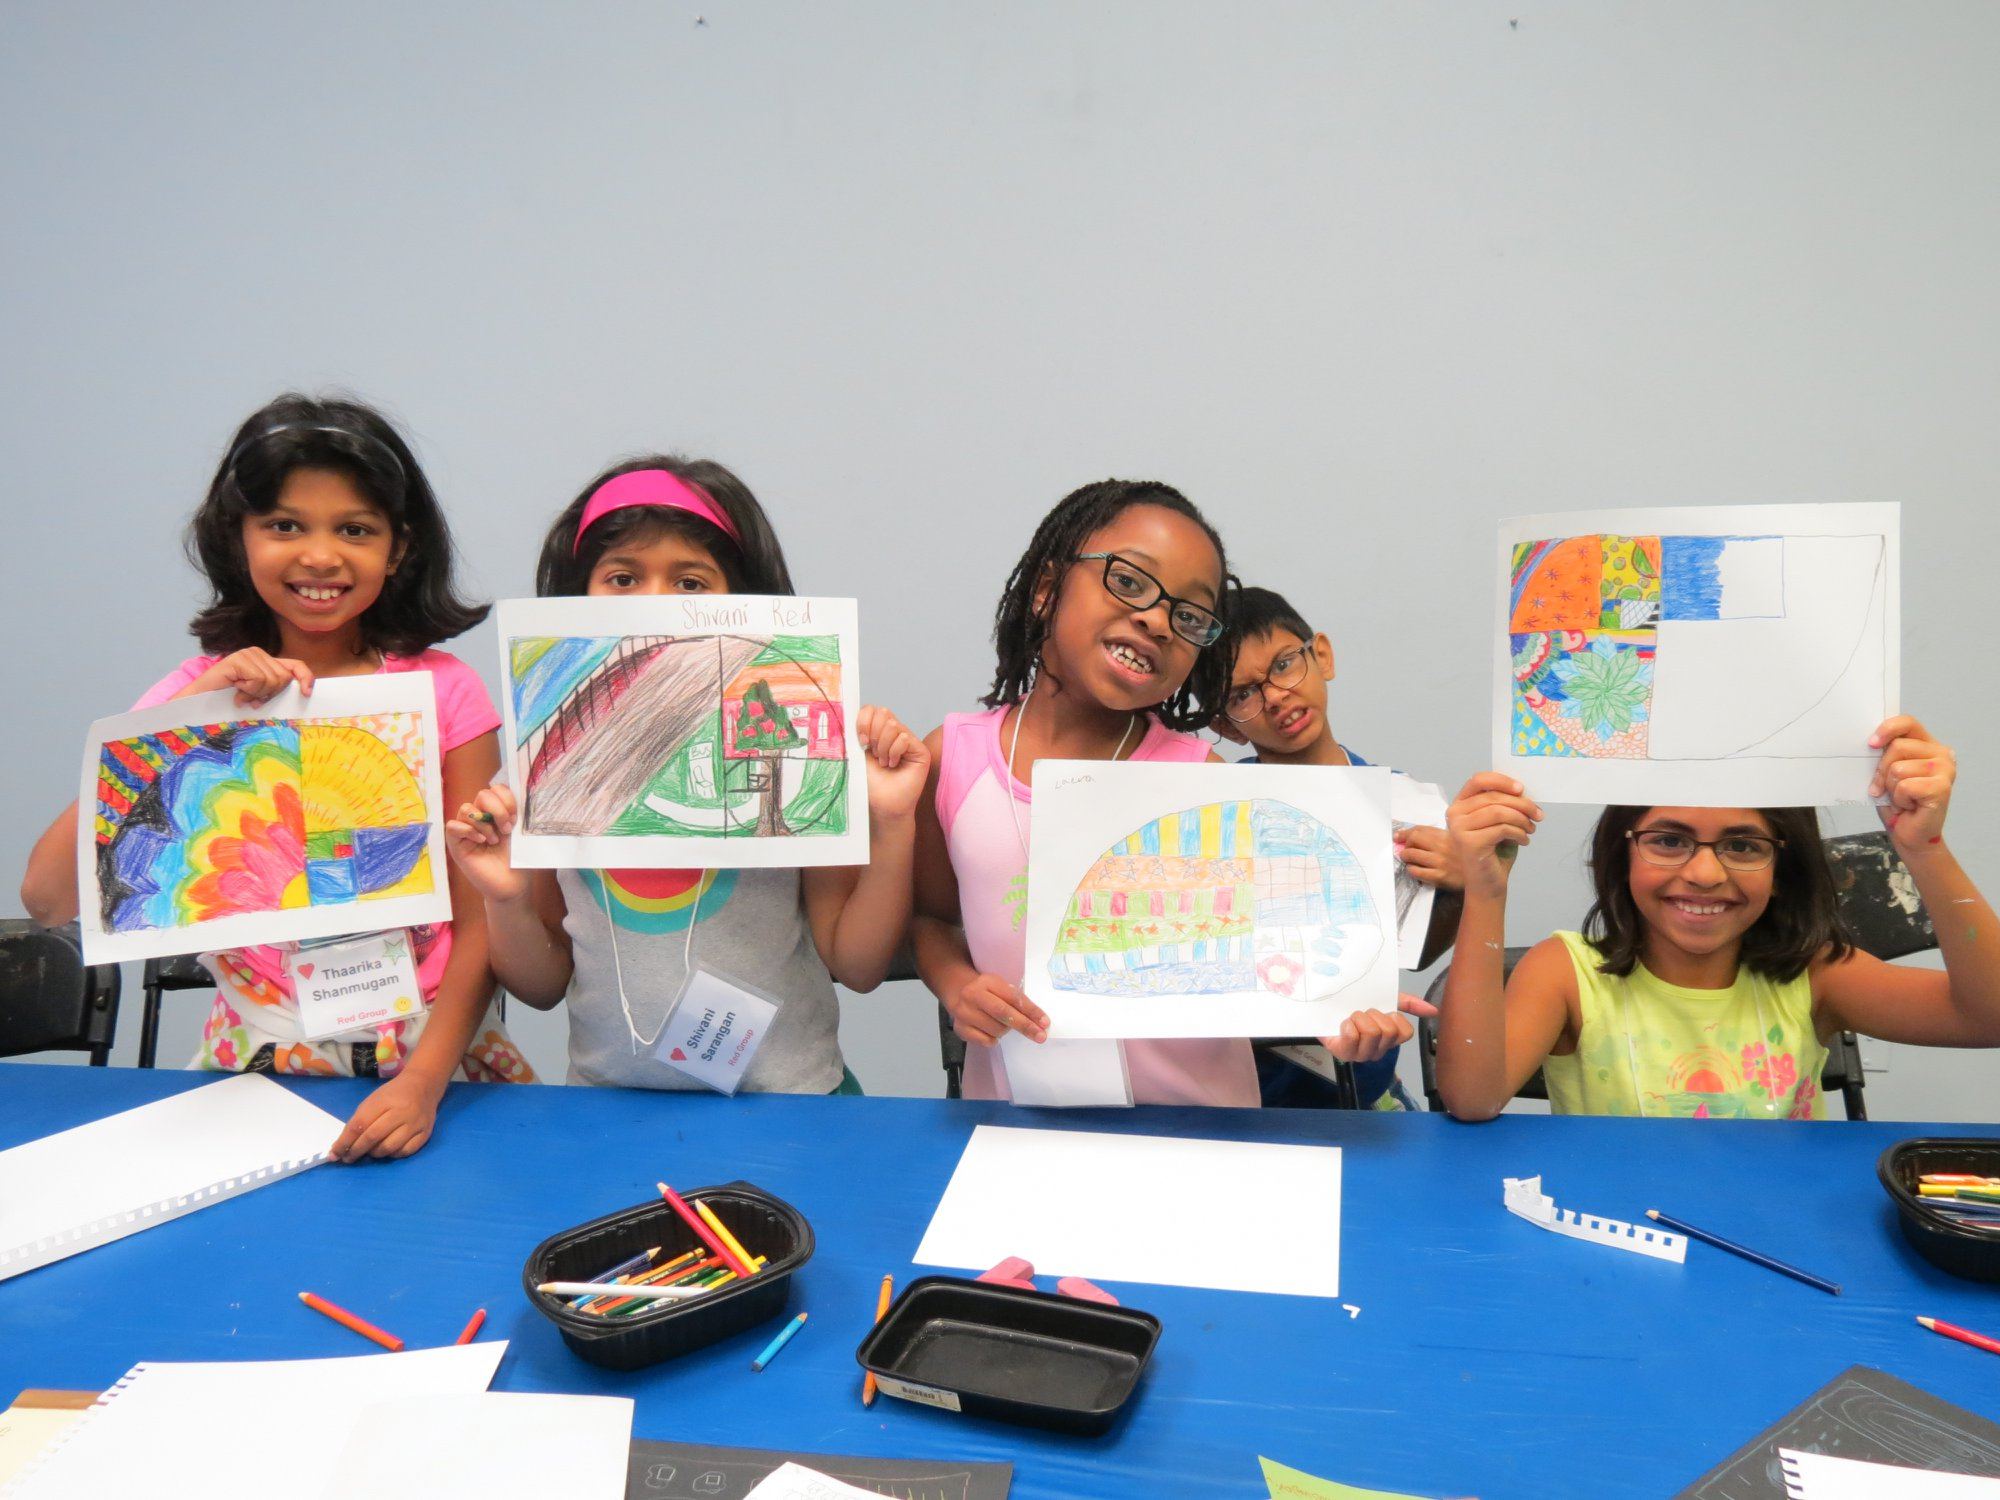 Photo: Irving Arts Center